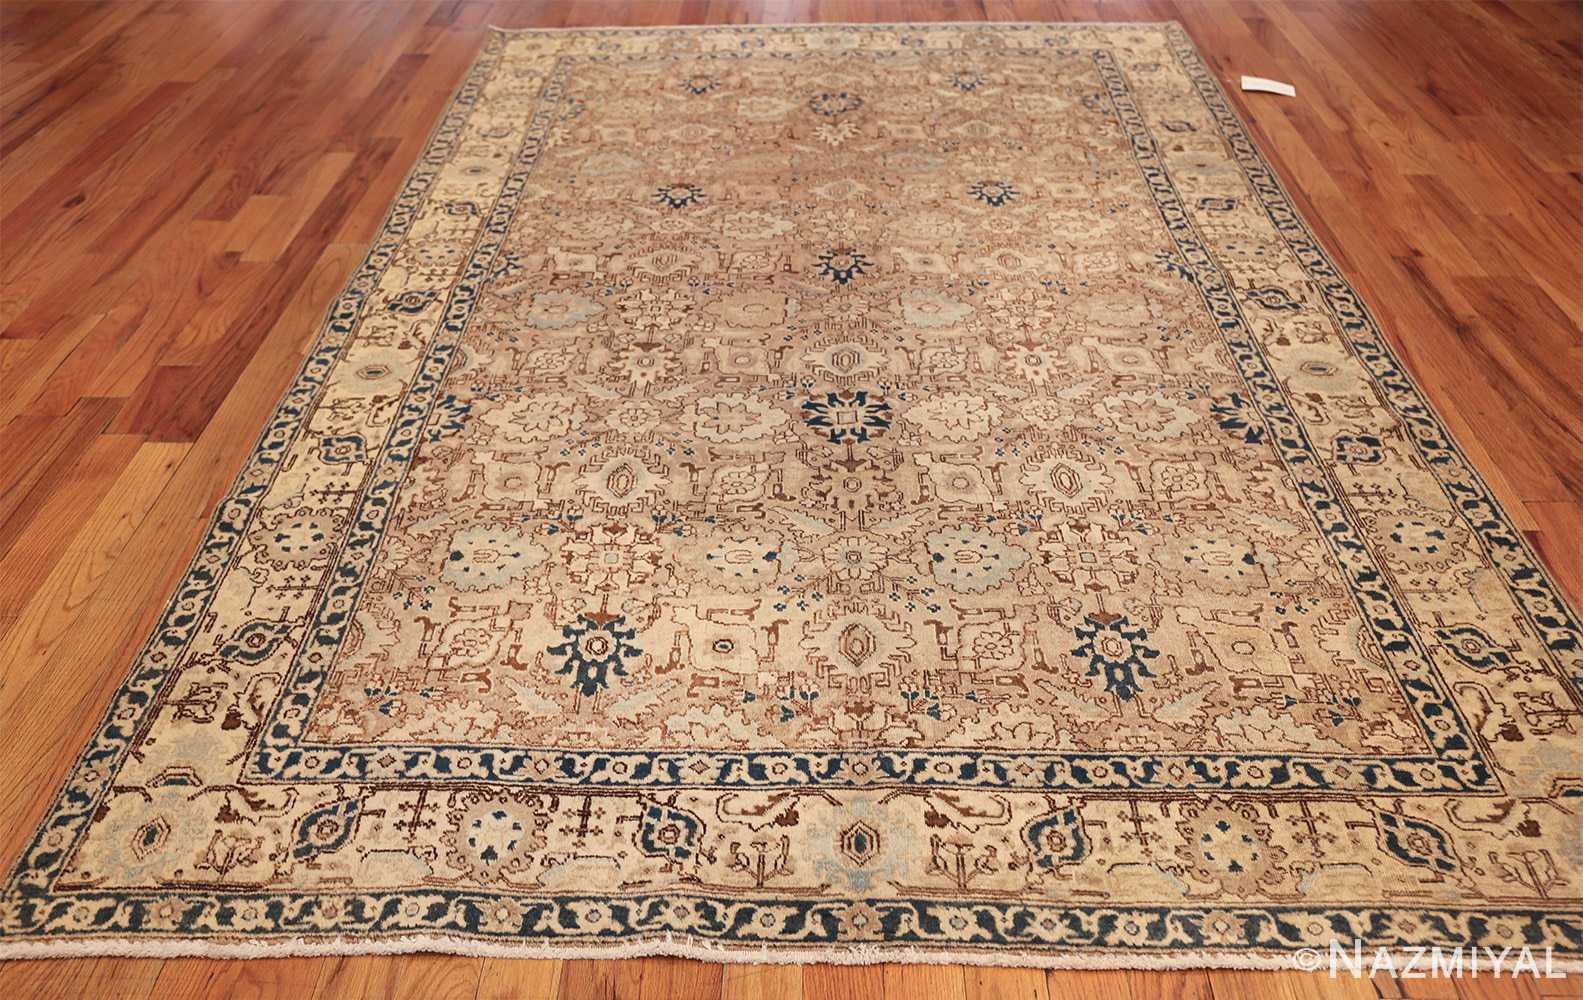 decorative neutral antique room size persian tabriz rug 49666 whole Nazmiyal